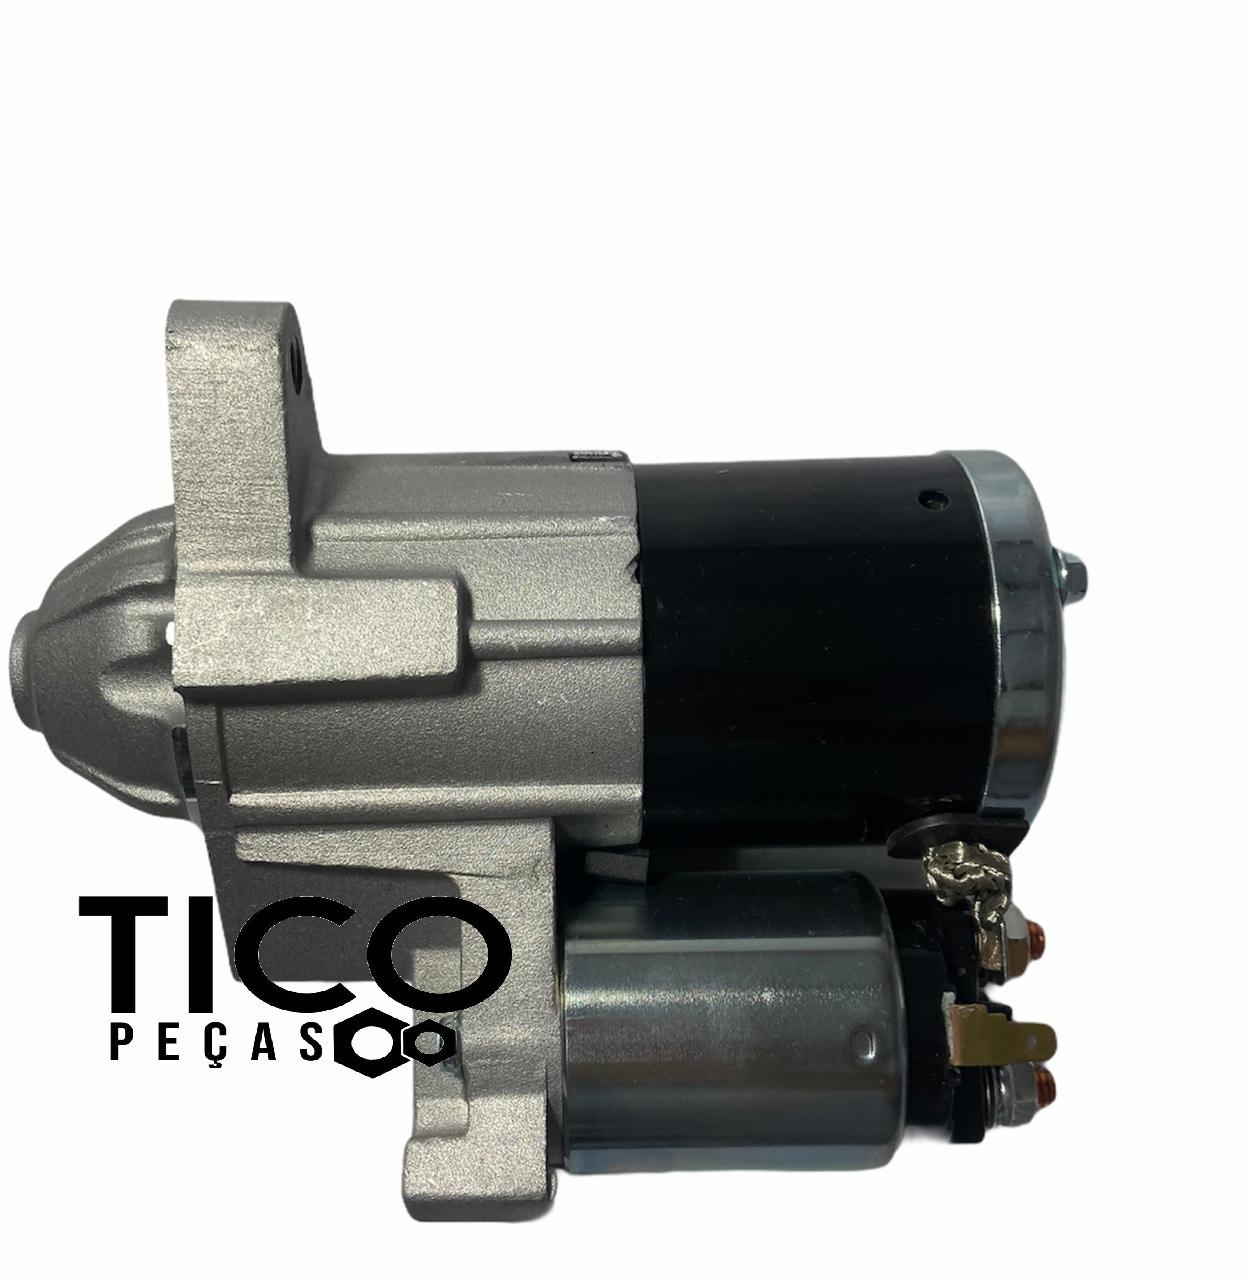 MOTOR DE PARTIDA 12V 10D - DITA 20327